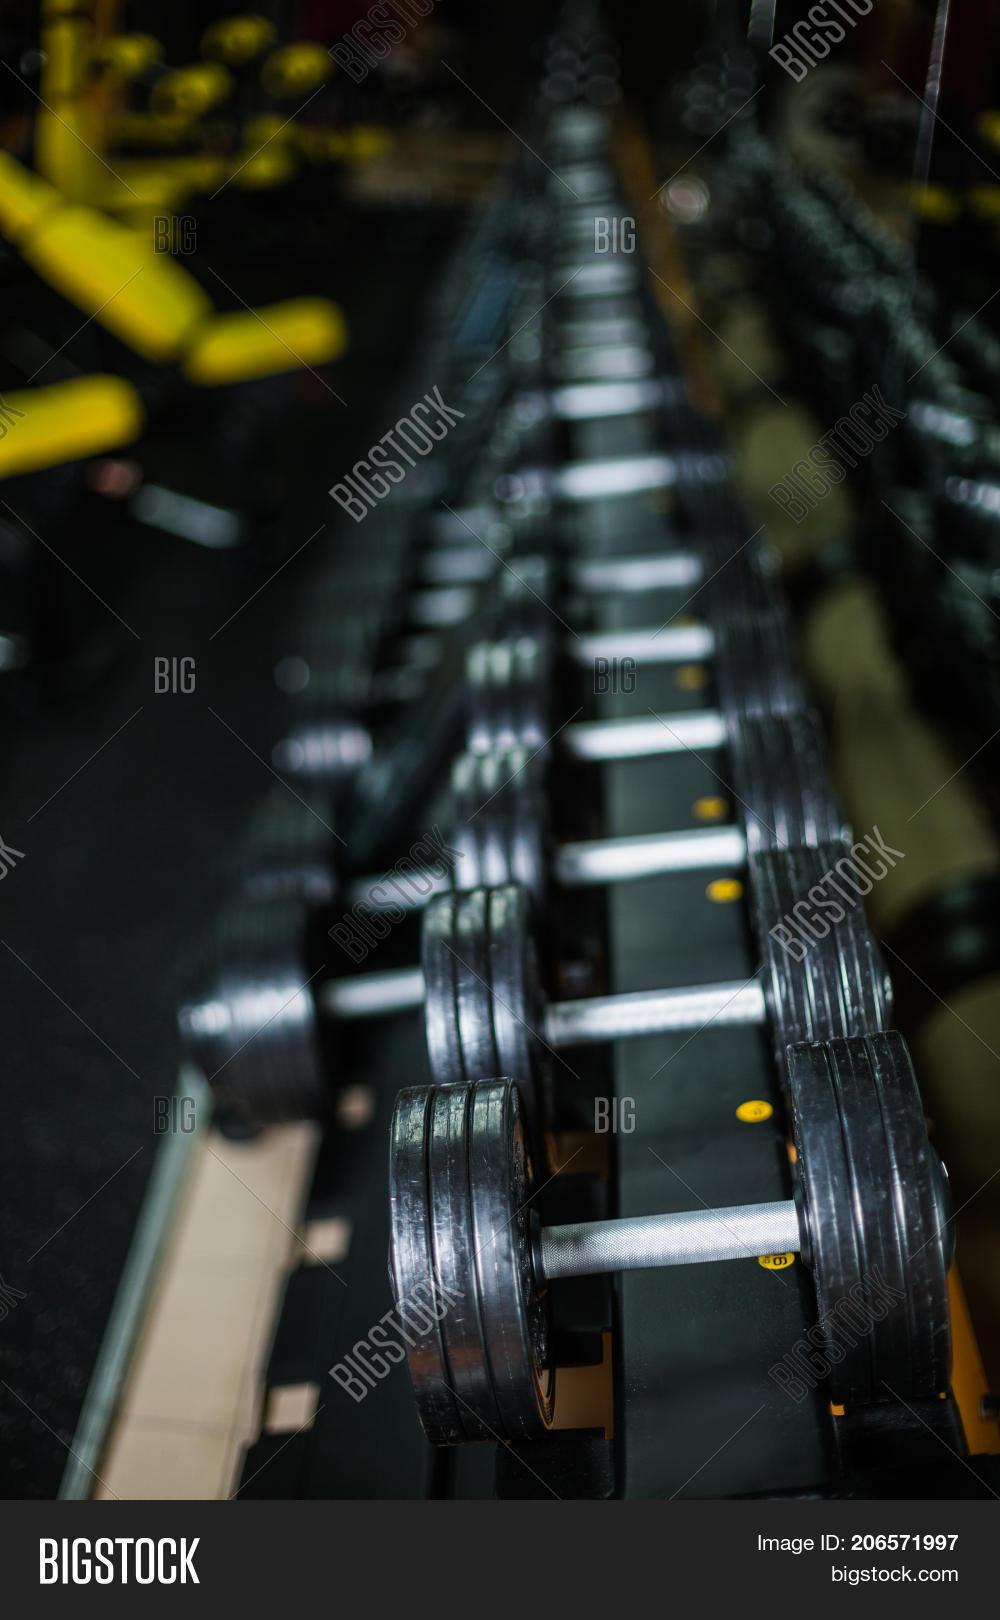 Set Dumbbells, Image & Photo (Free Trial) | Bigstock